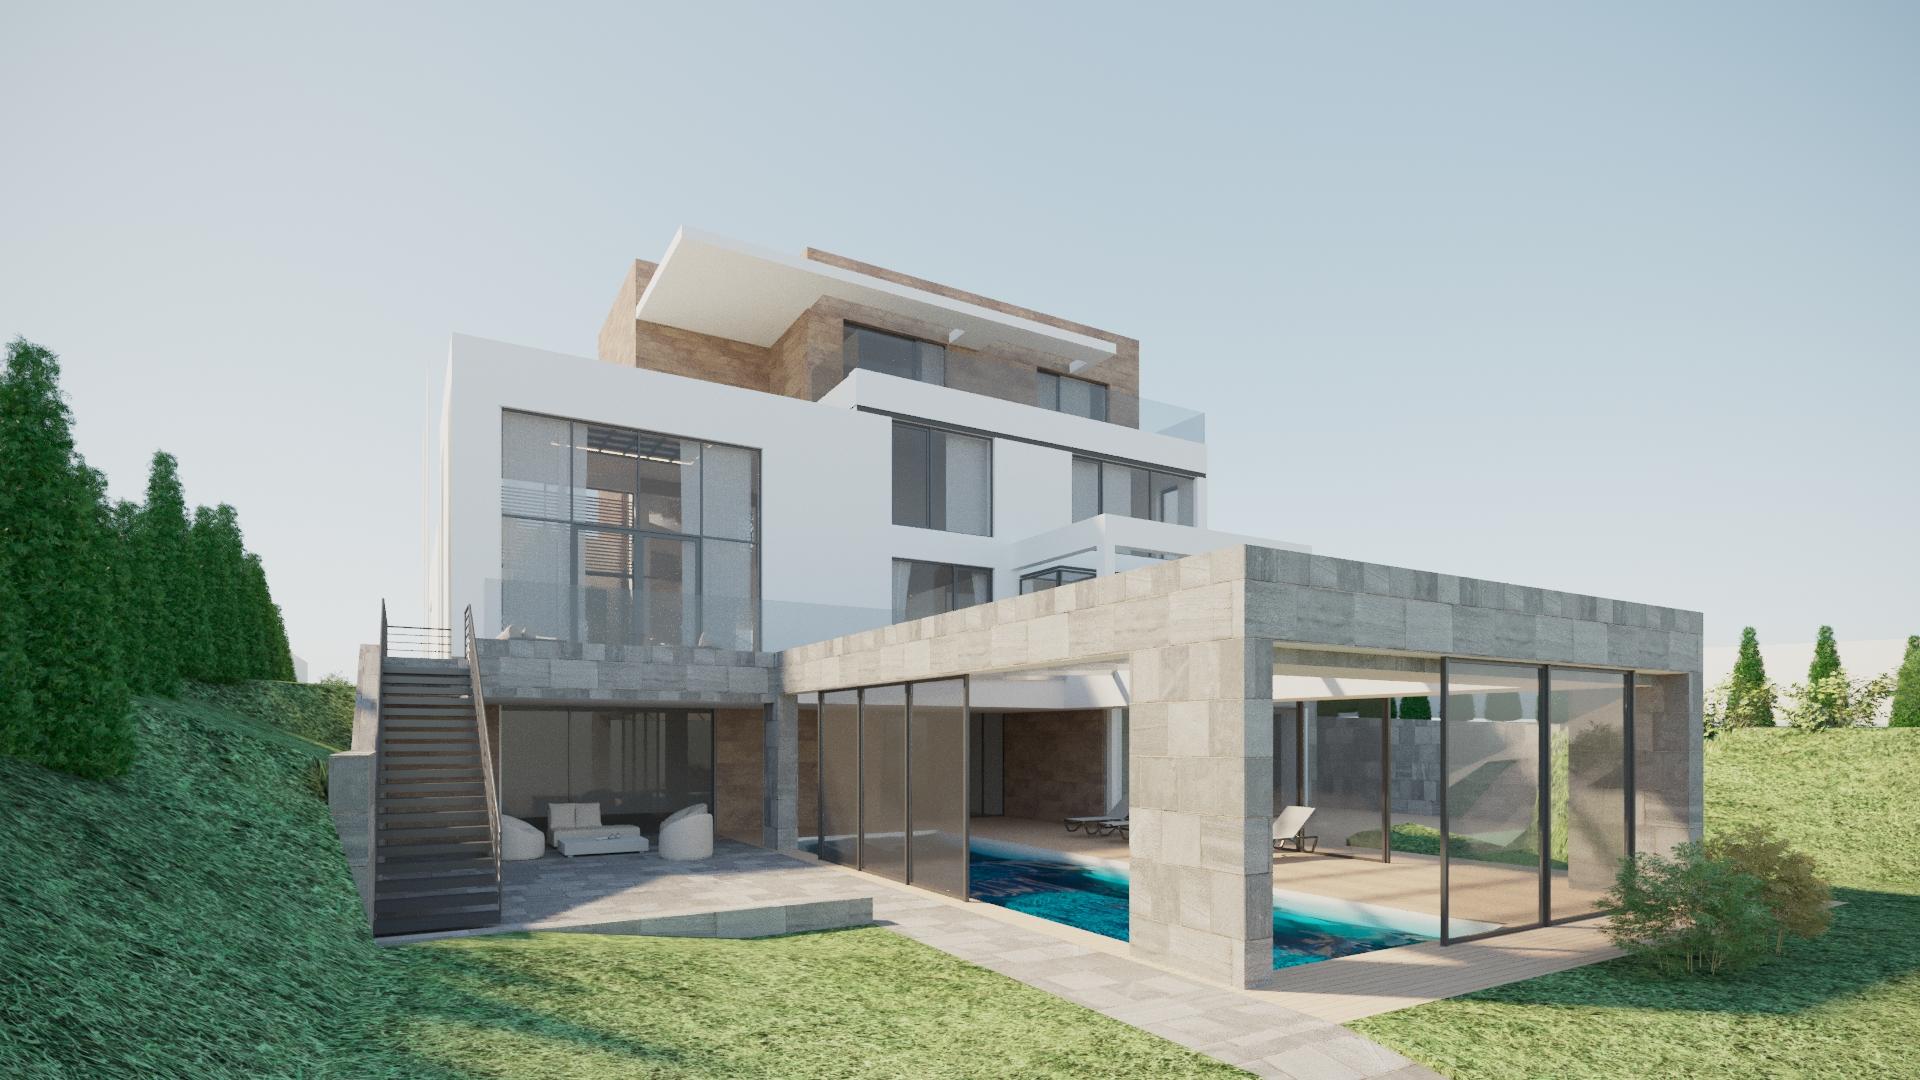 https://nbc-arhitect.ro/wp-content/uploads/2020/10/NBC-Arhitect-_-residences-_-Mogo-Villa-_-Romania-_-exterior-view_3.jpg